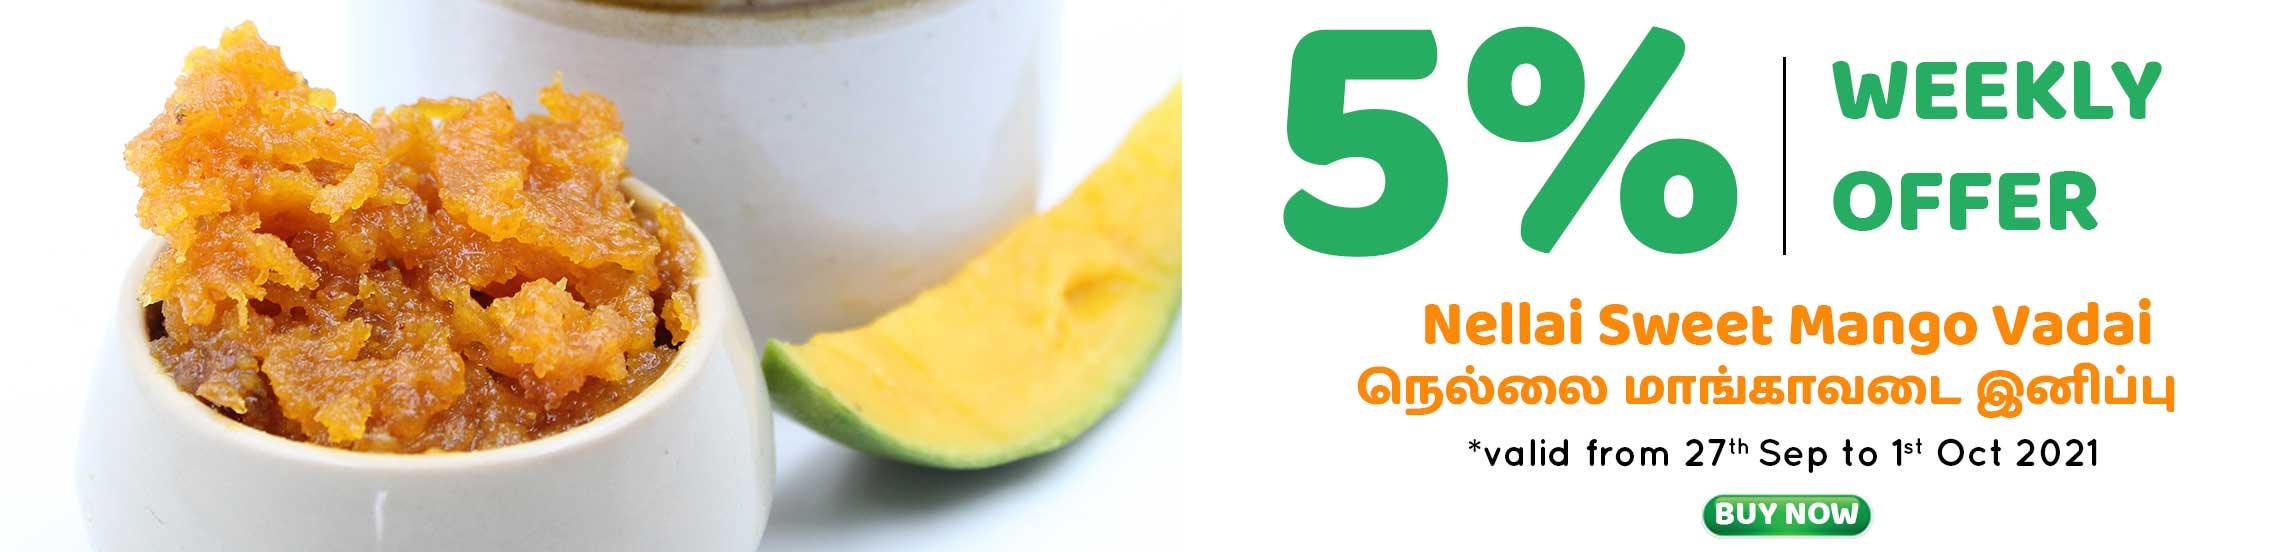 ns-banner-mango-vadai-offer